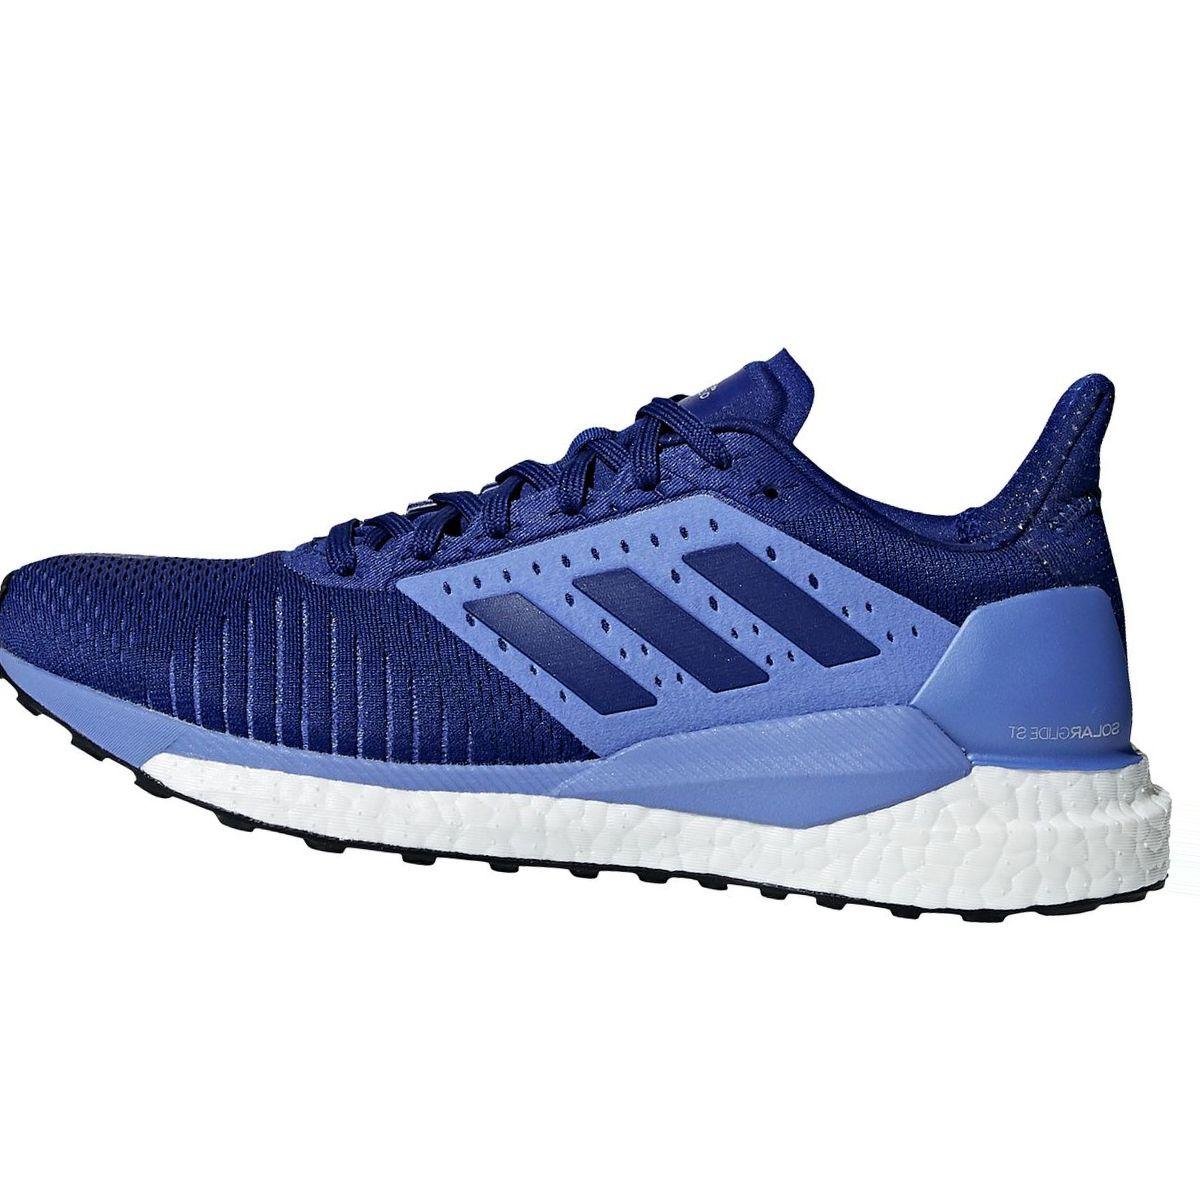 Adidas Solar Glide ST Boost Running Shoe - Women's